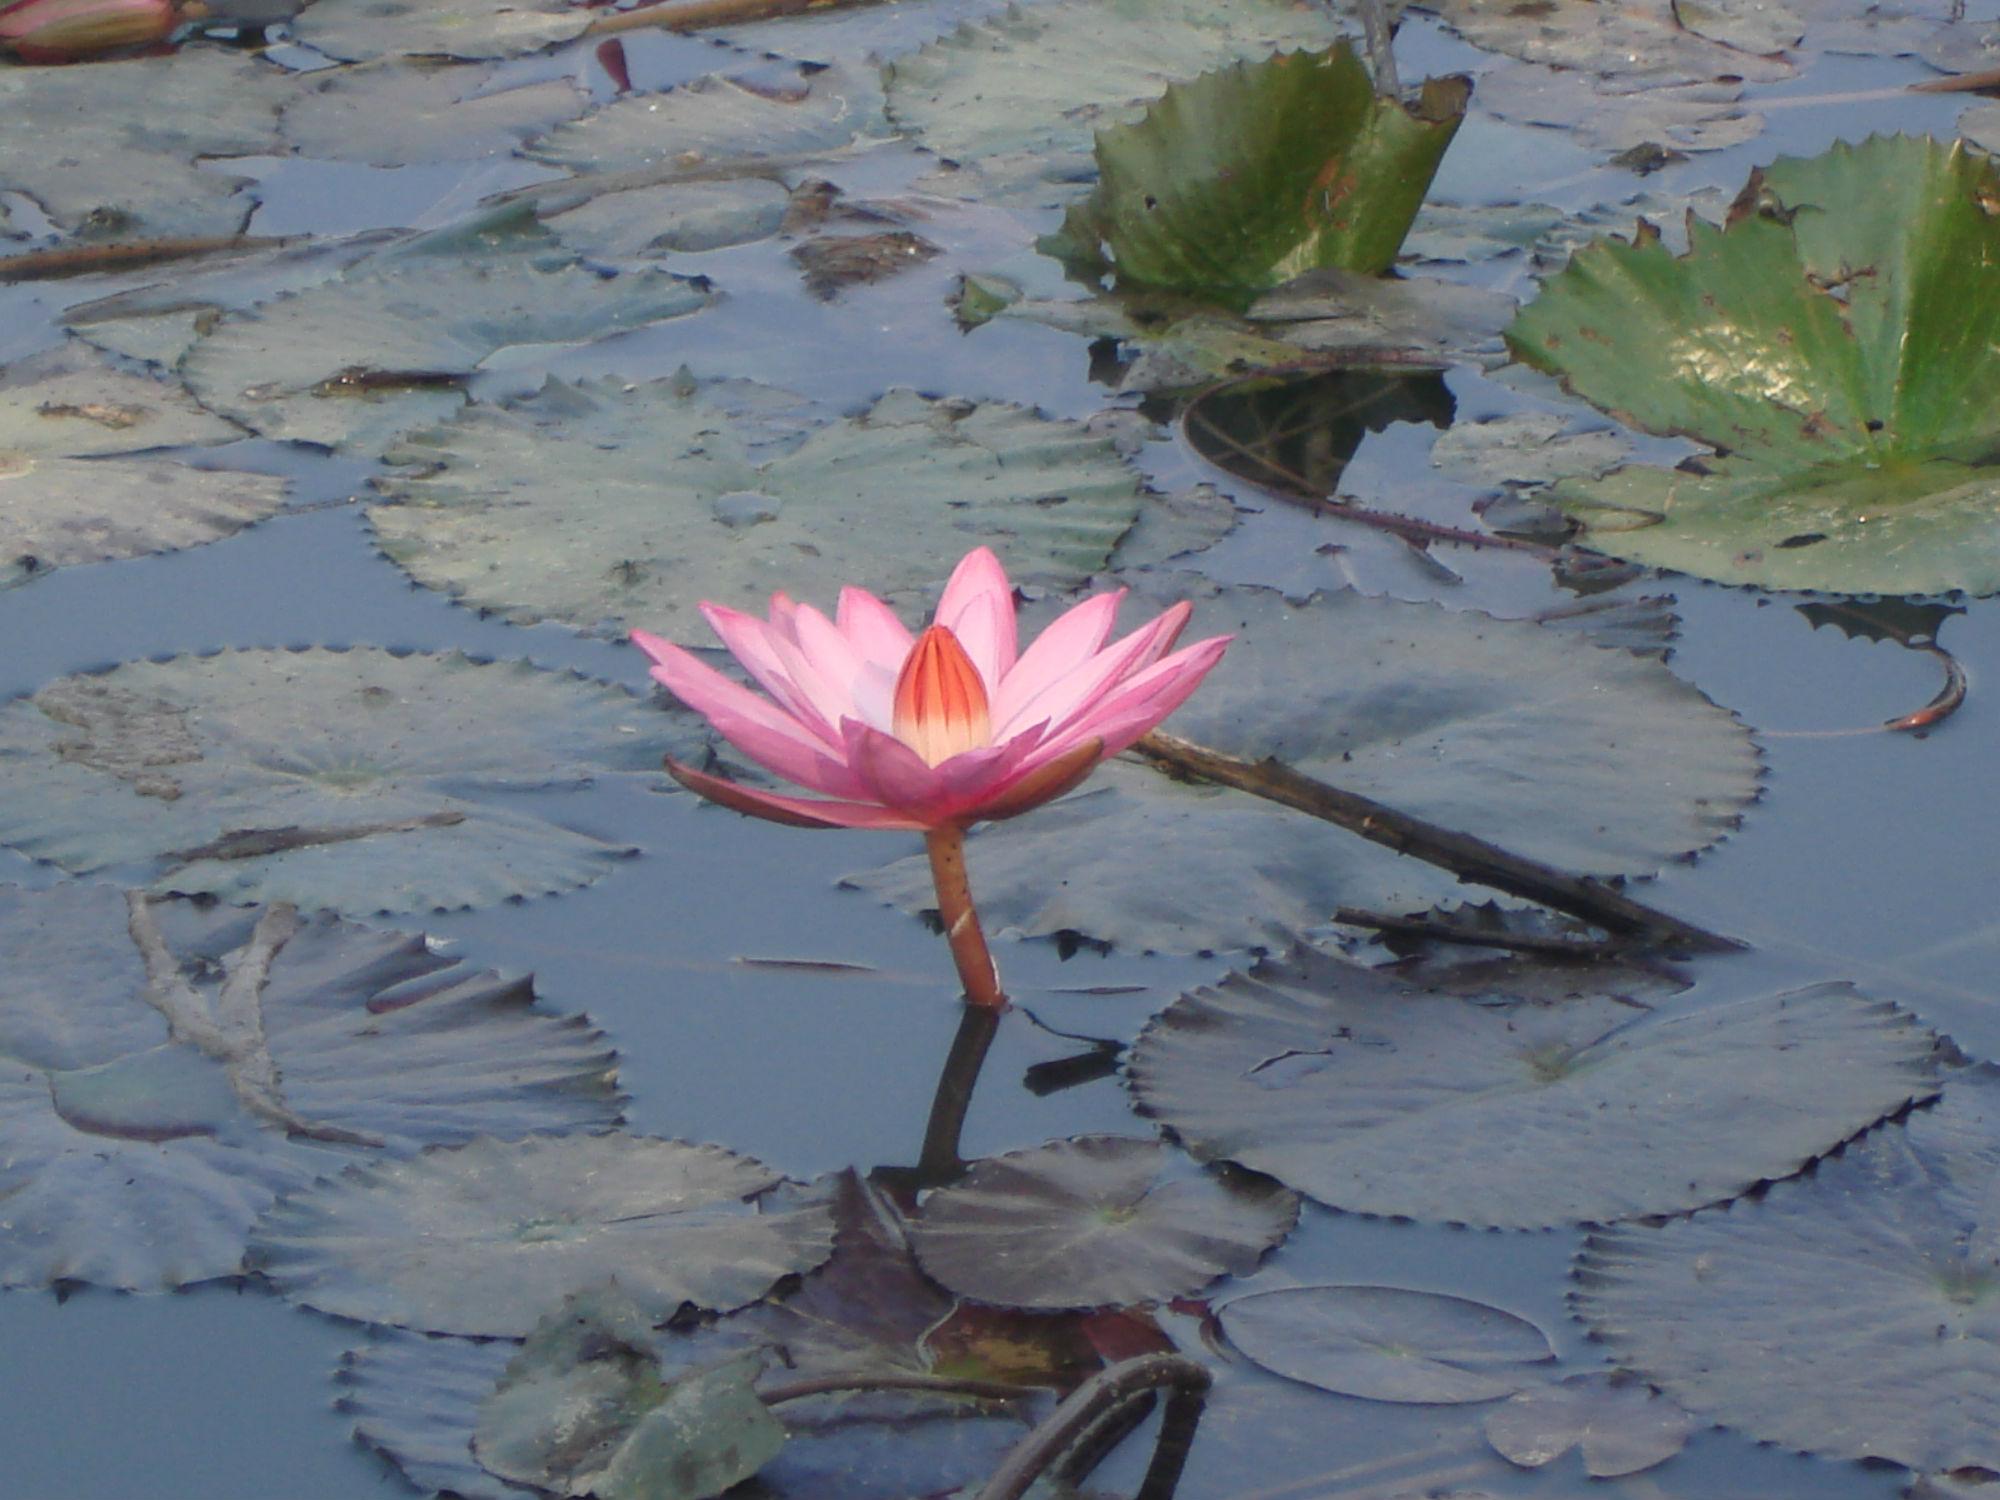 photo-deepak-adhikari-lotus-flower-cc-by-sa